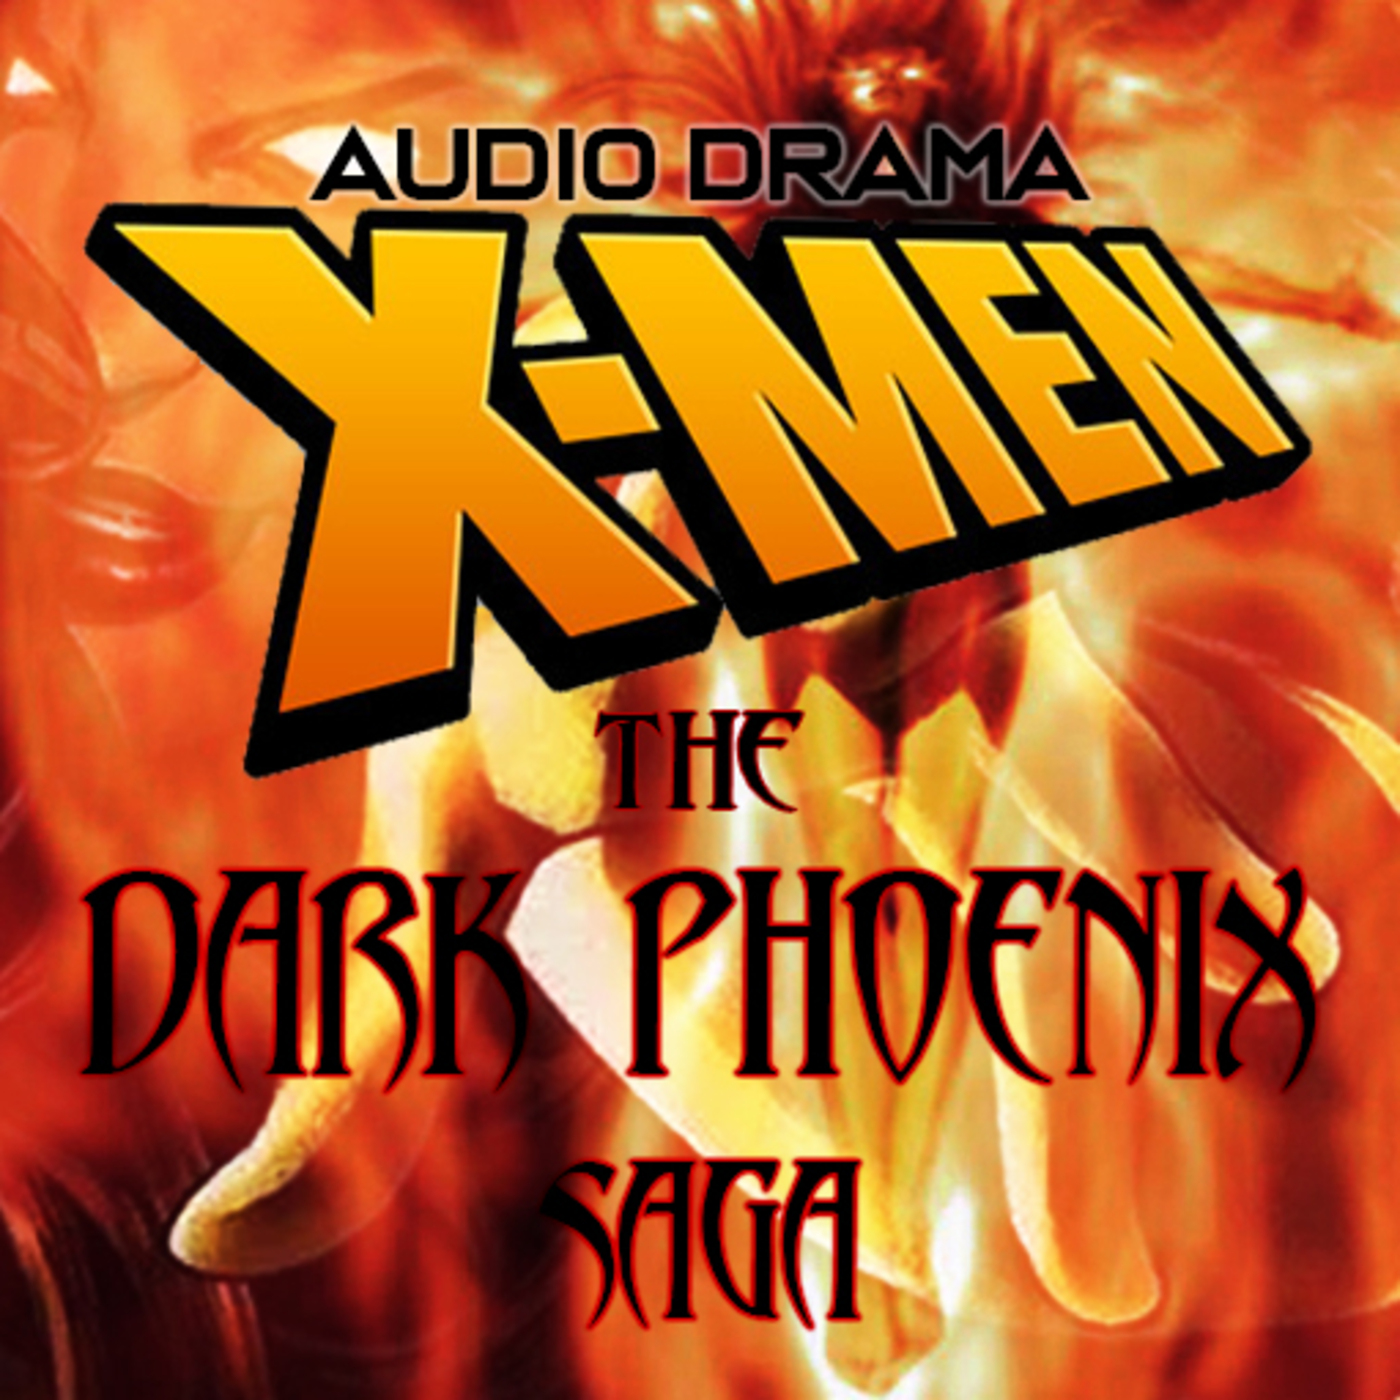 What Happened To X-Men The Audio Drama? Series Update 6 6 19